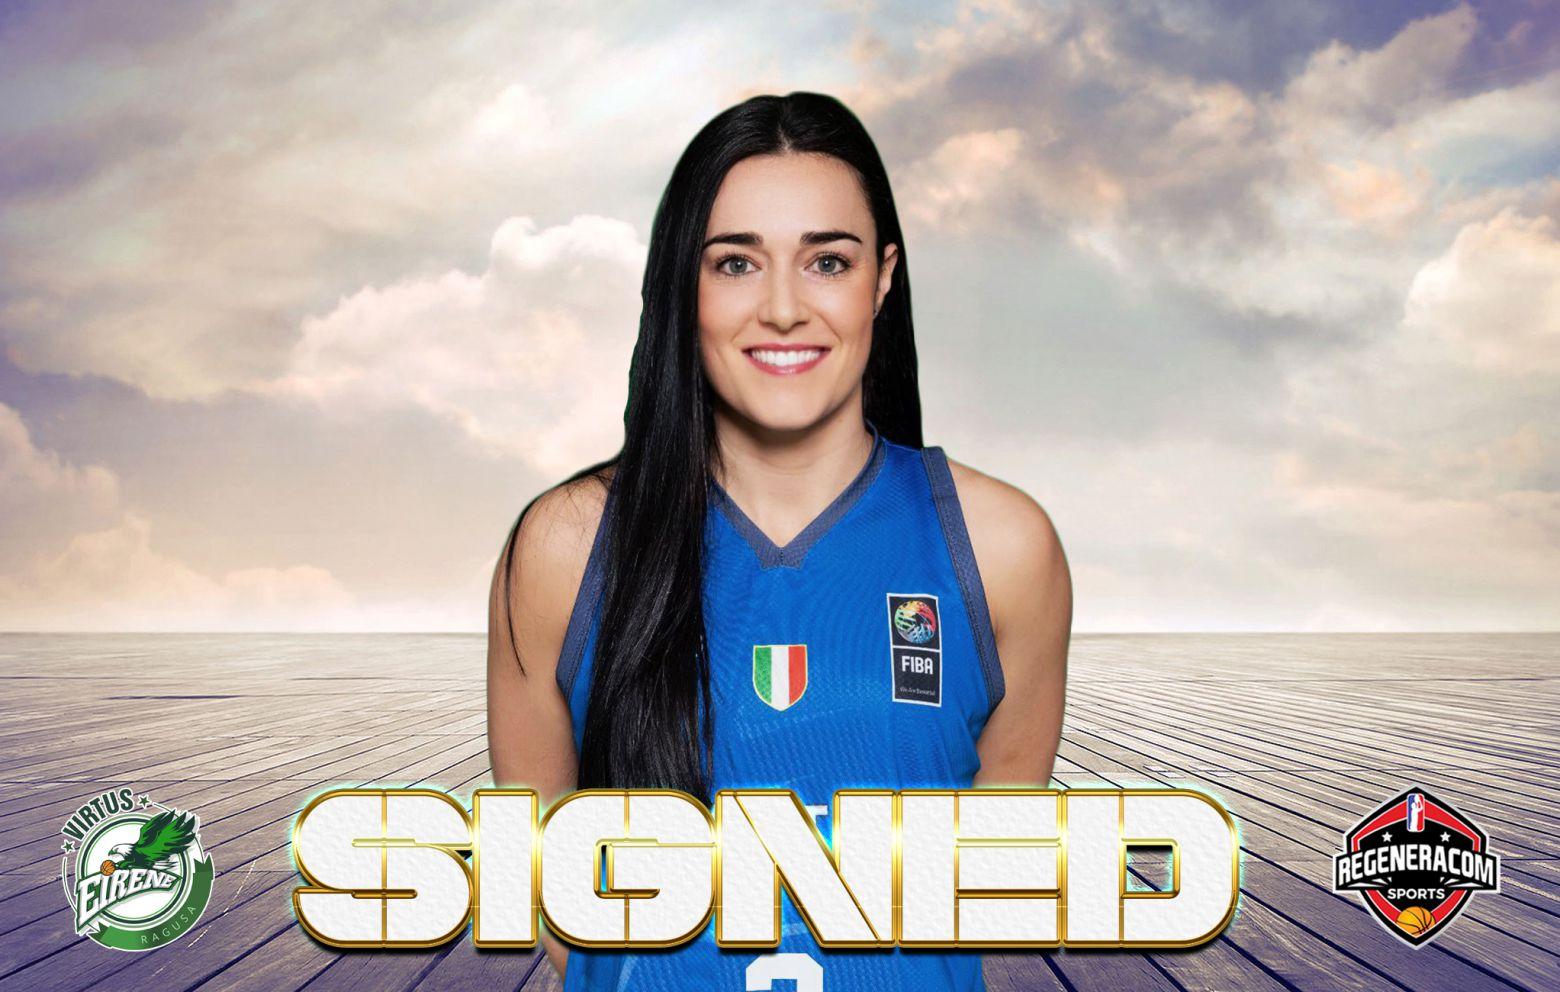 NICOLE ROMEO has signed with Ragusa for the 2021/22 season